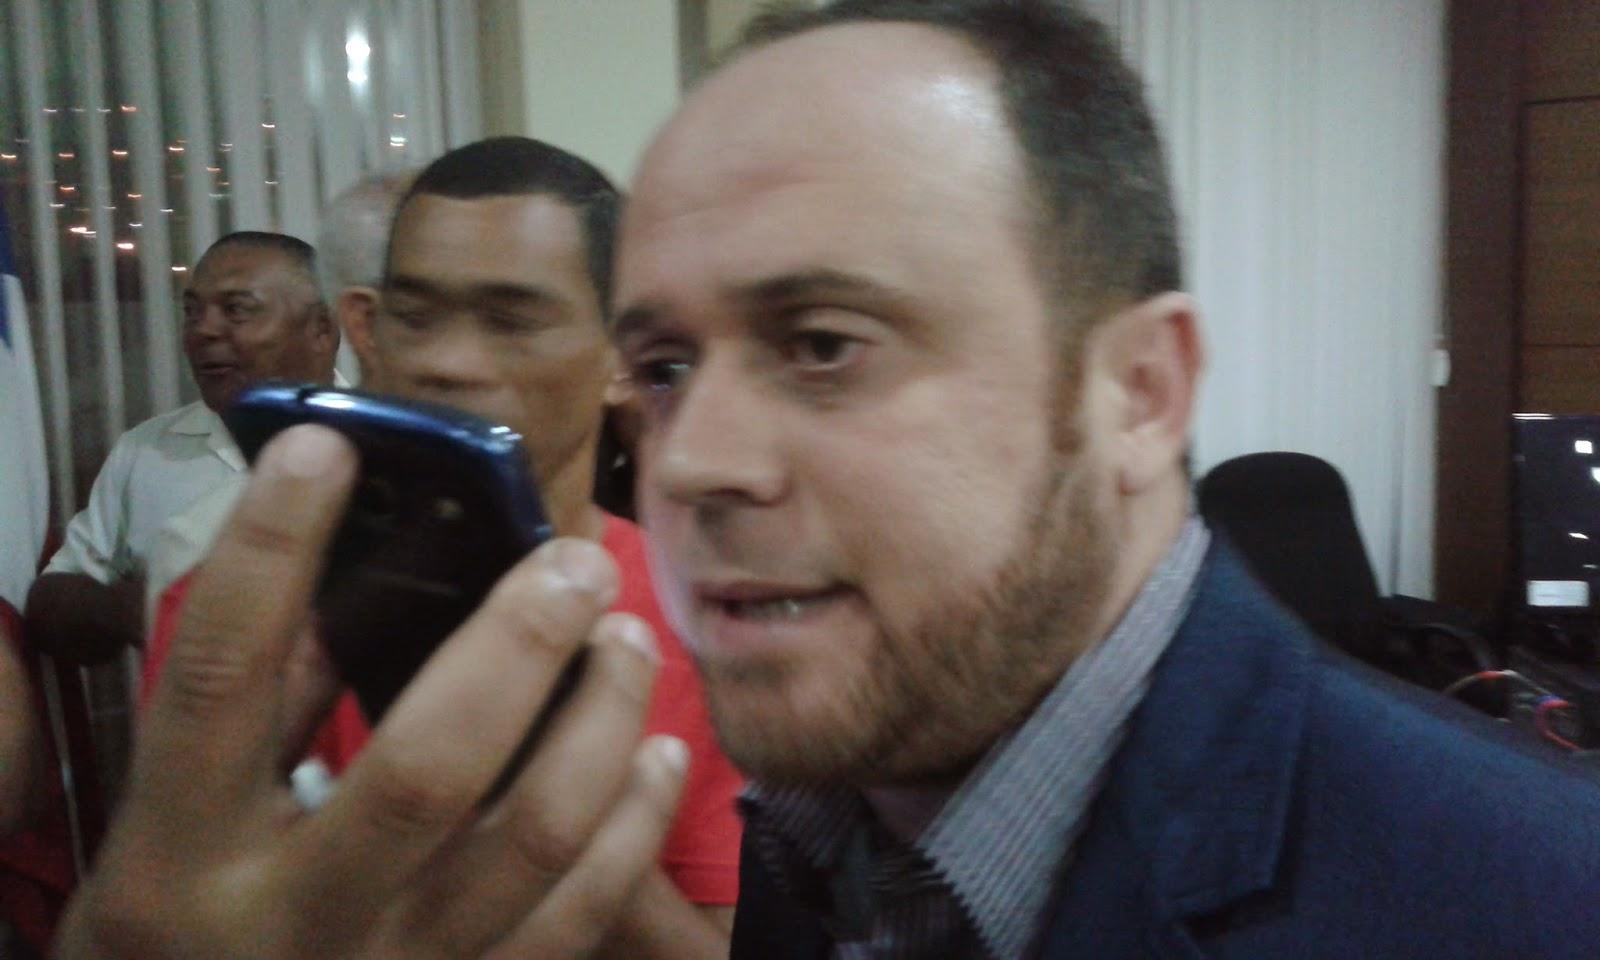 Por 09 a 06 Clériston Moreira é eleito novo Presidente da Câmara de Vereadores de Jacobina